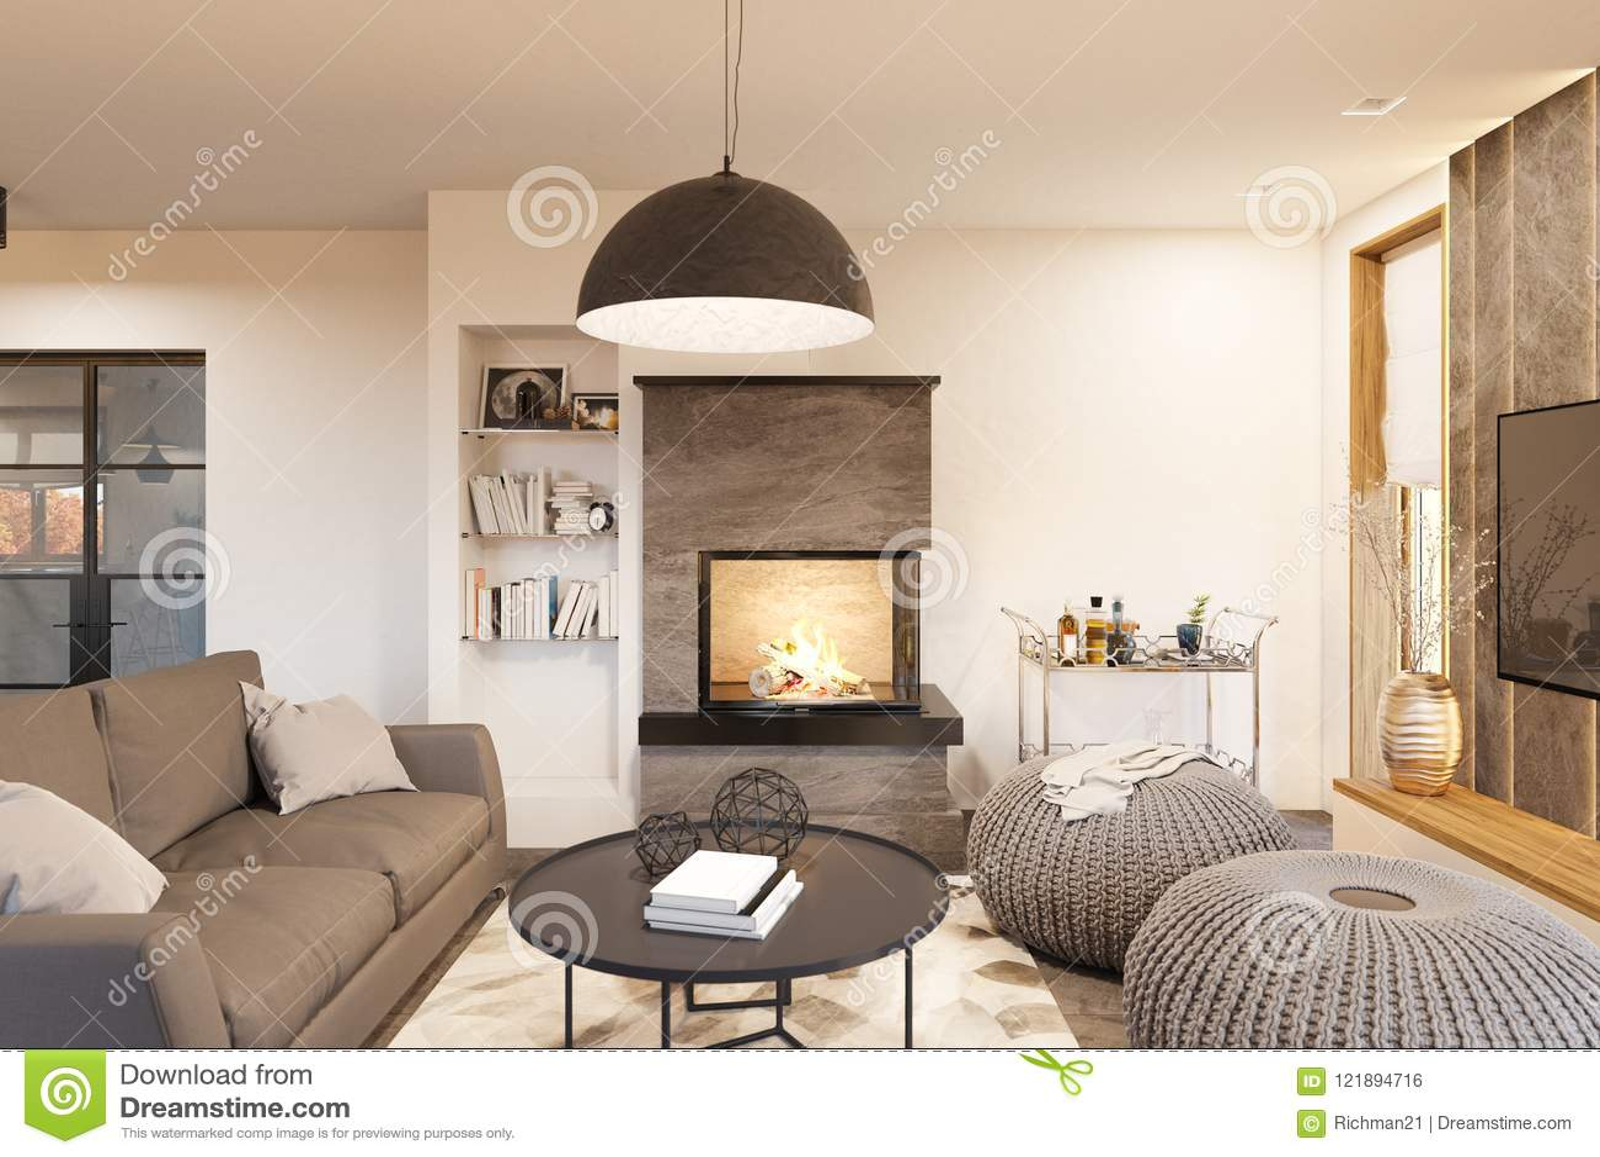 Living room interior design modern house in the scandinavian minimalist style hygge interior 3d render 3d illustration